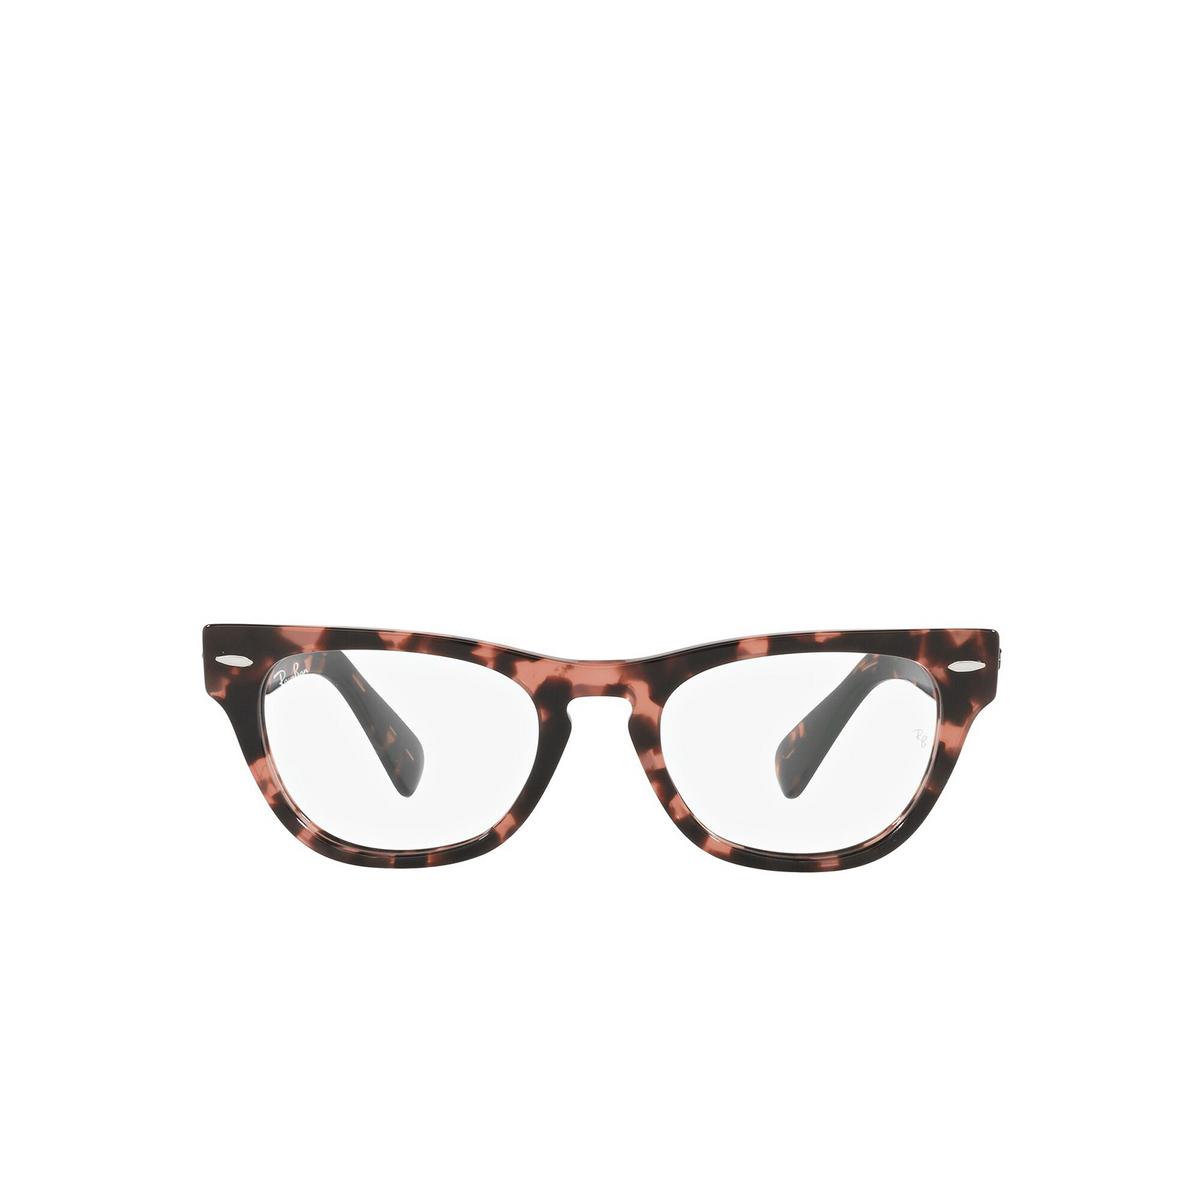 Ray-Ban® Cat-eye Eyeglasses: Laramie RX2201V color Pink Havana 8118 - front view.